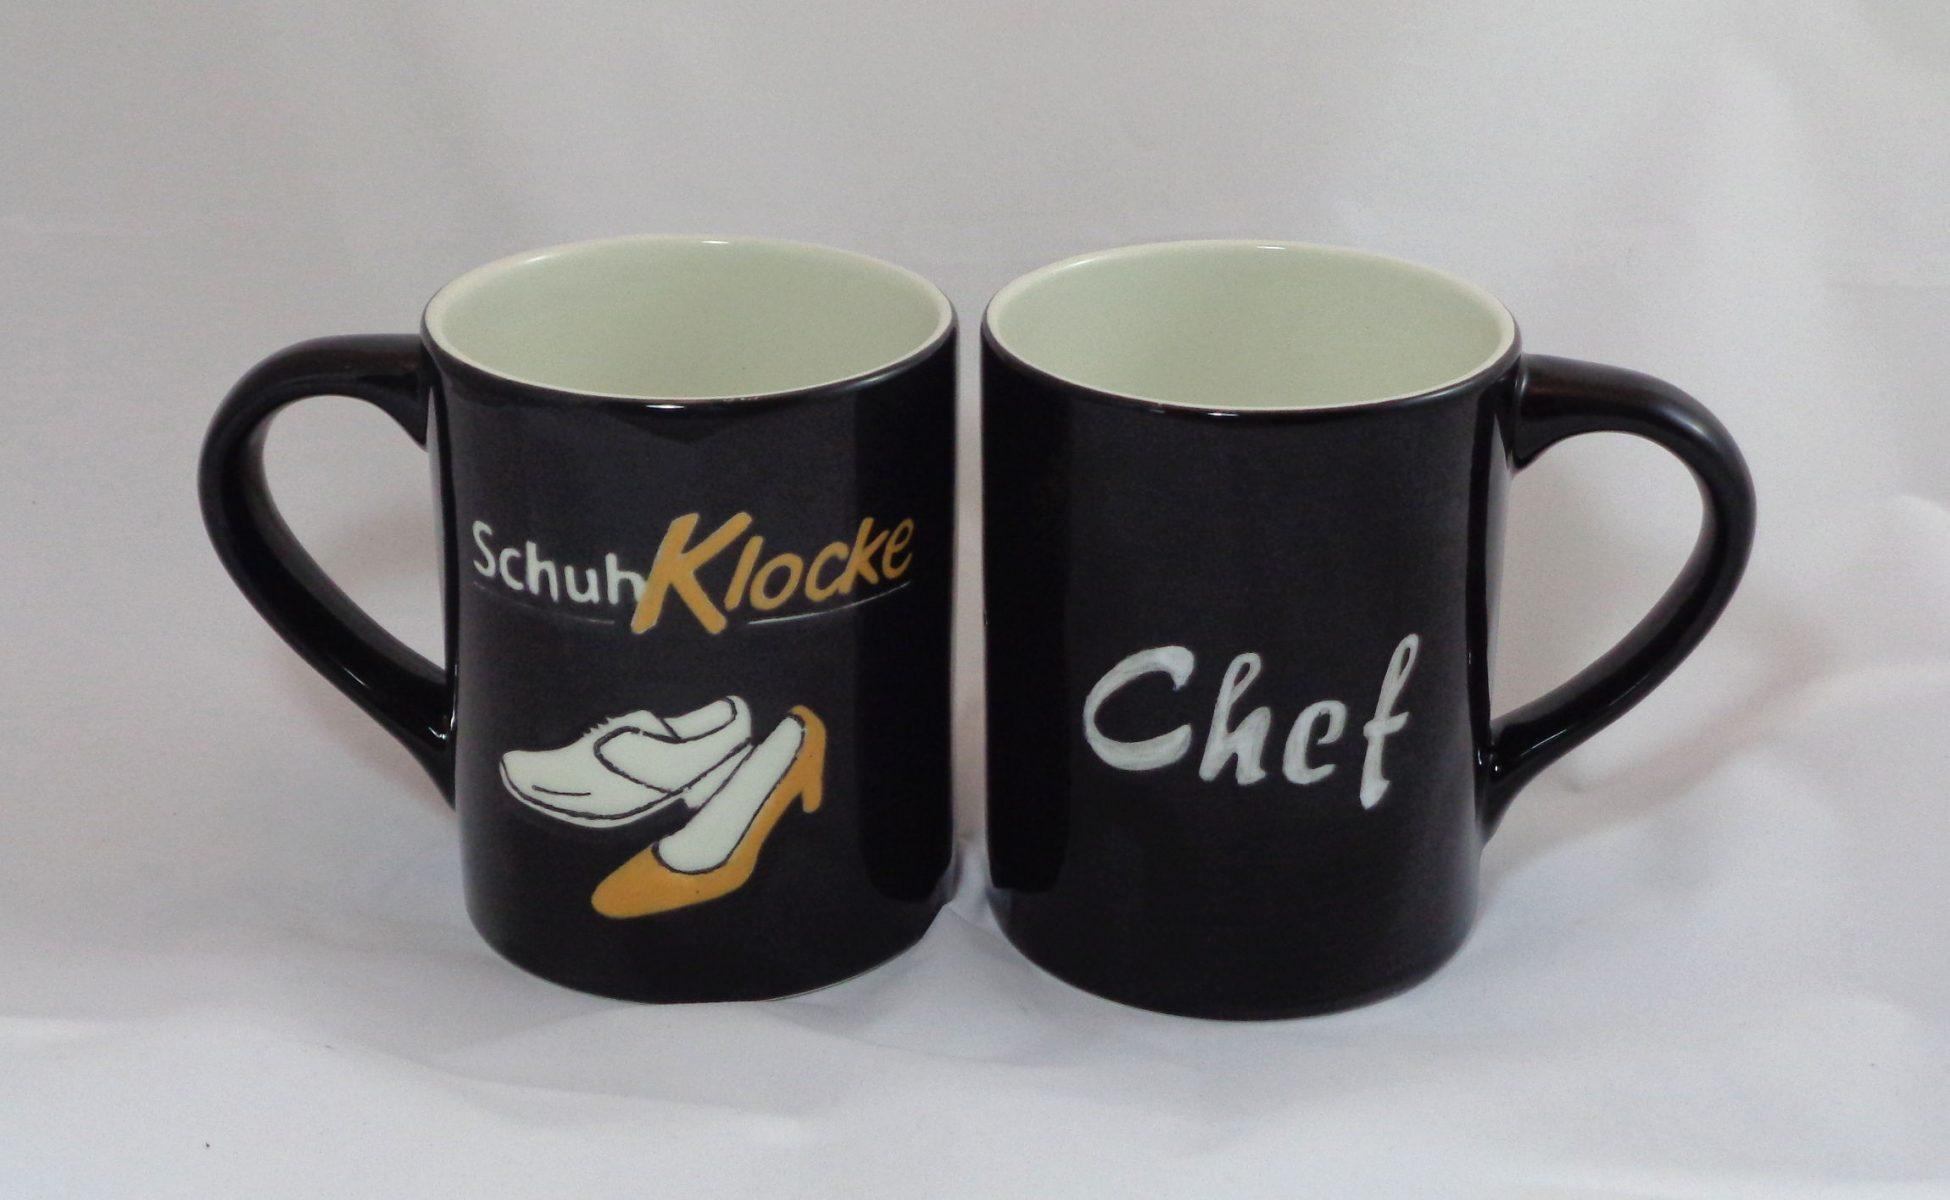 Bemalte Keramik Kaffeebecher Schuh-Klocke